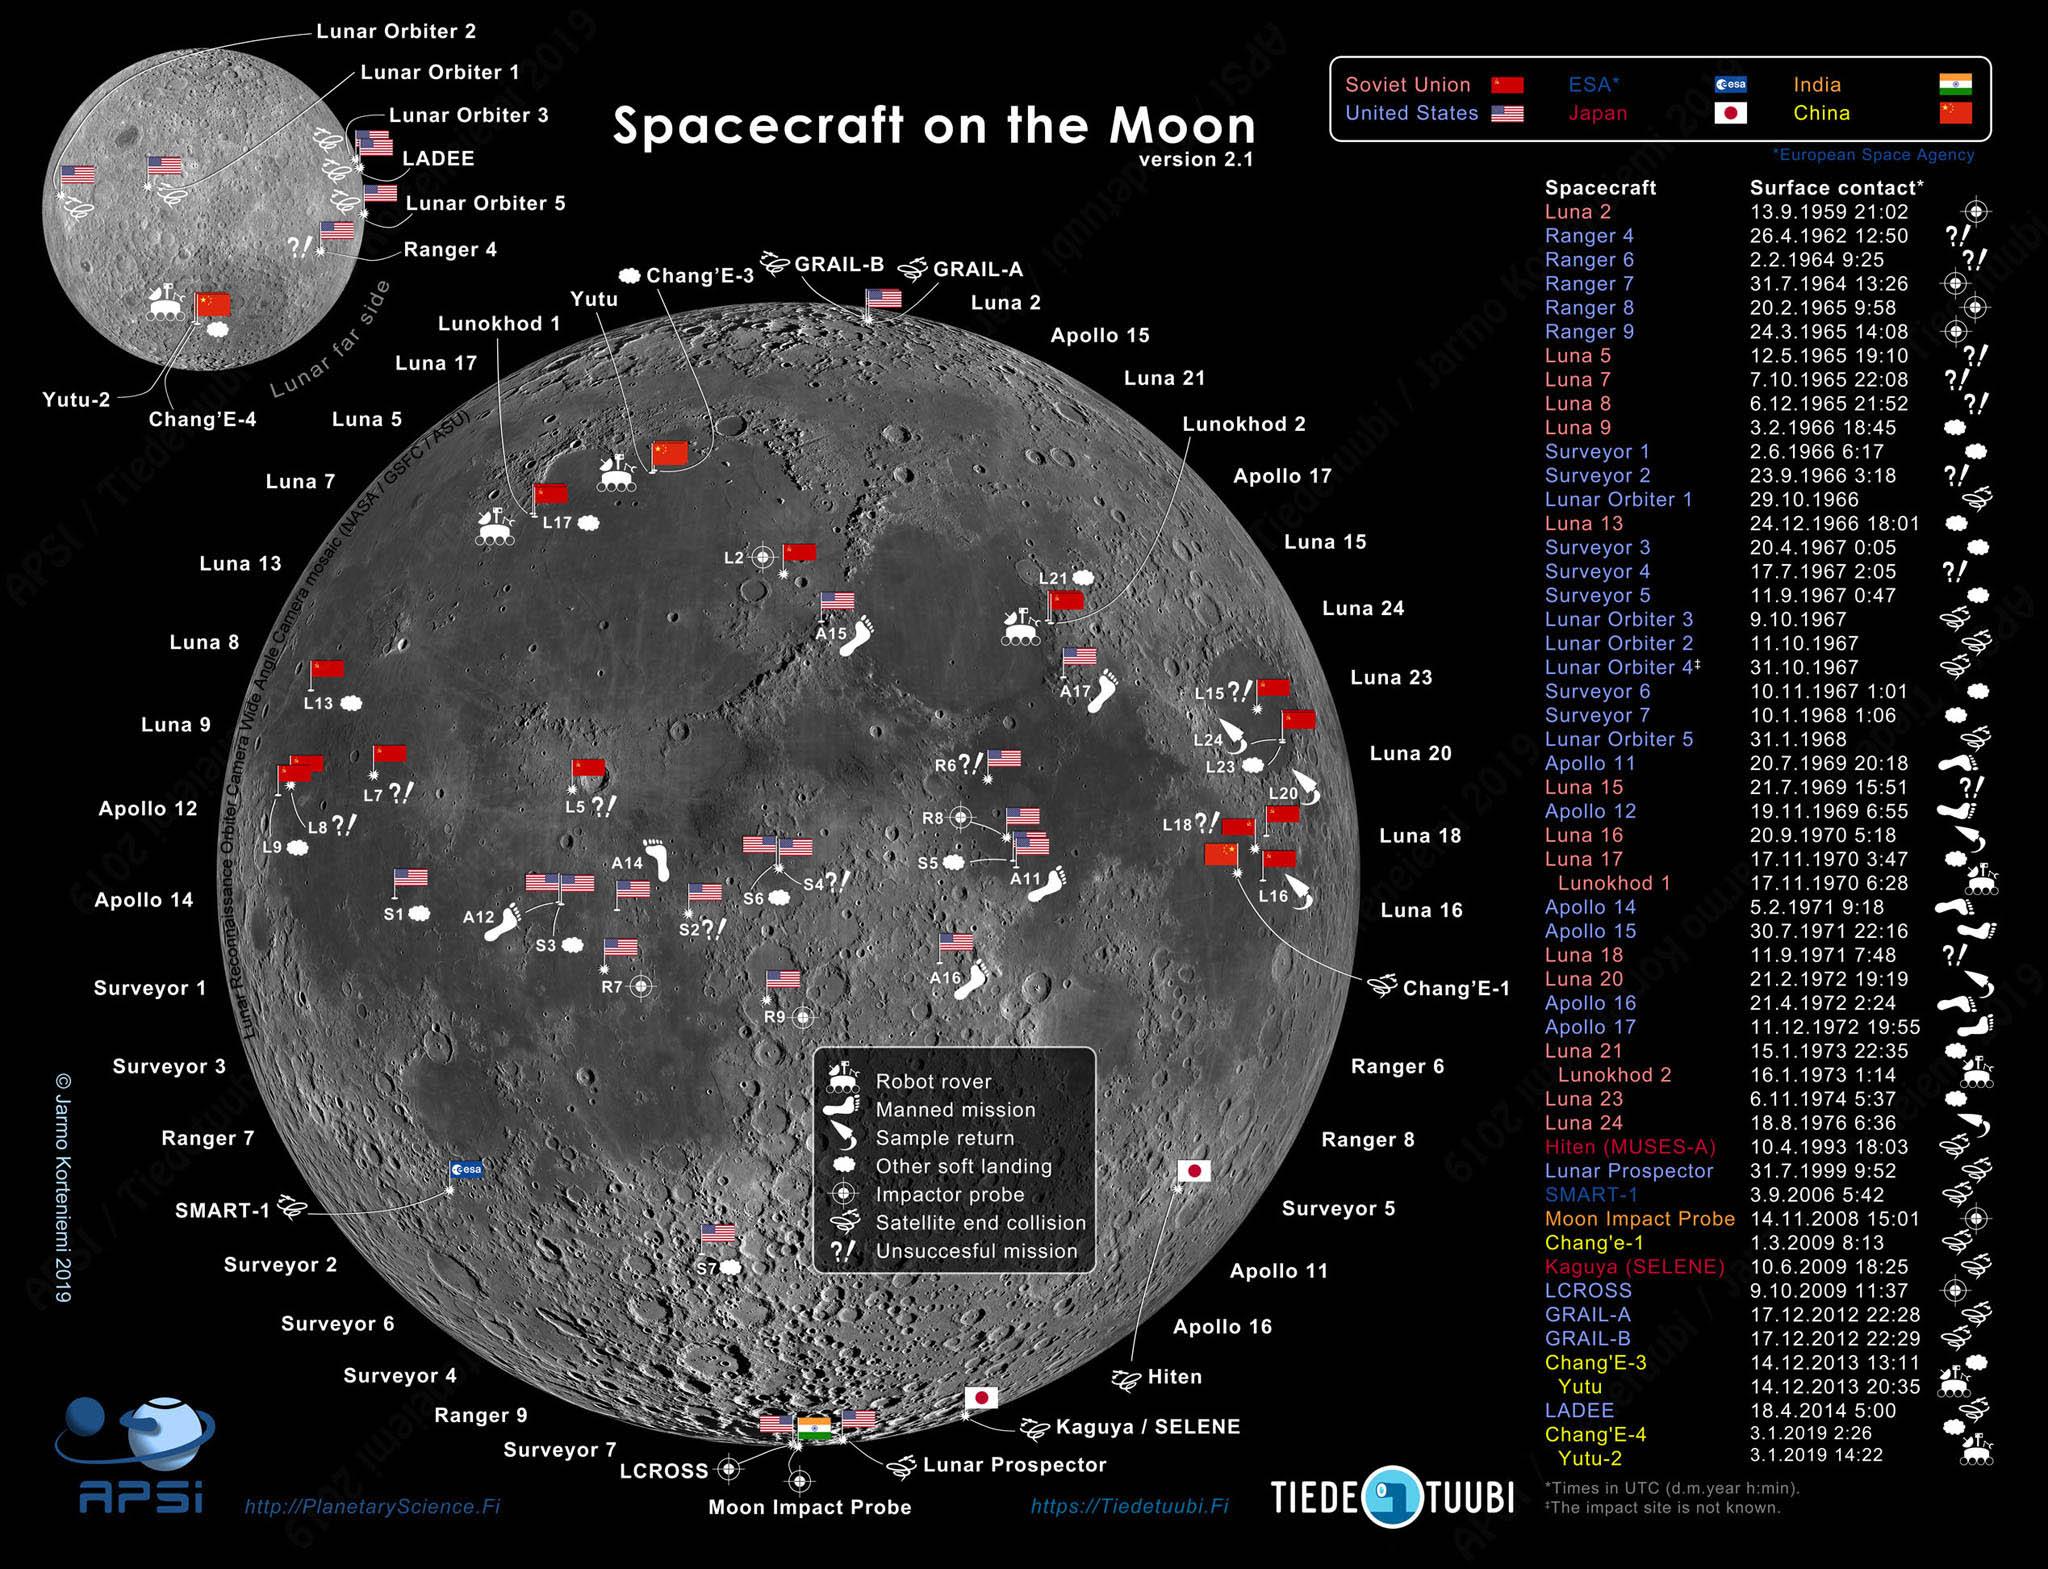 http://planetaryscience.fi/wp-content/uploads/2019/01/hard-and-soft-landings_2048wm.jpg